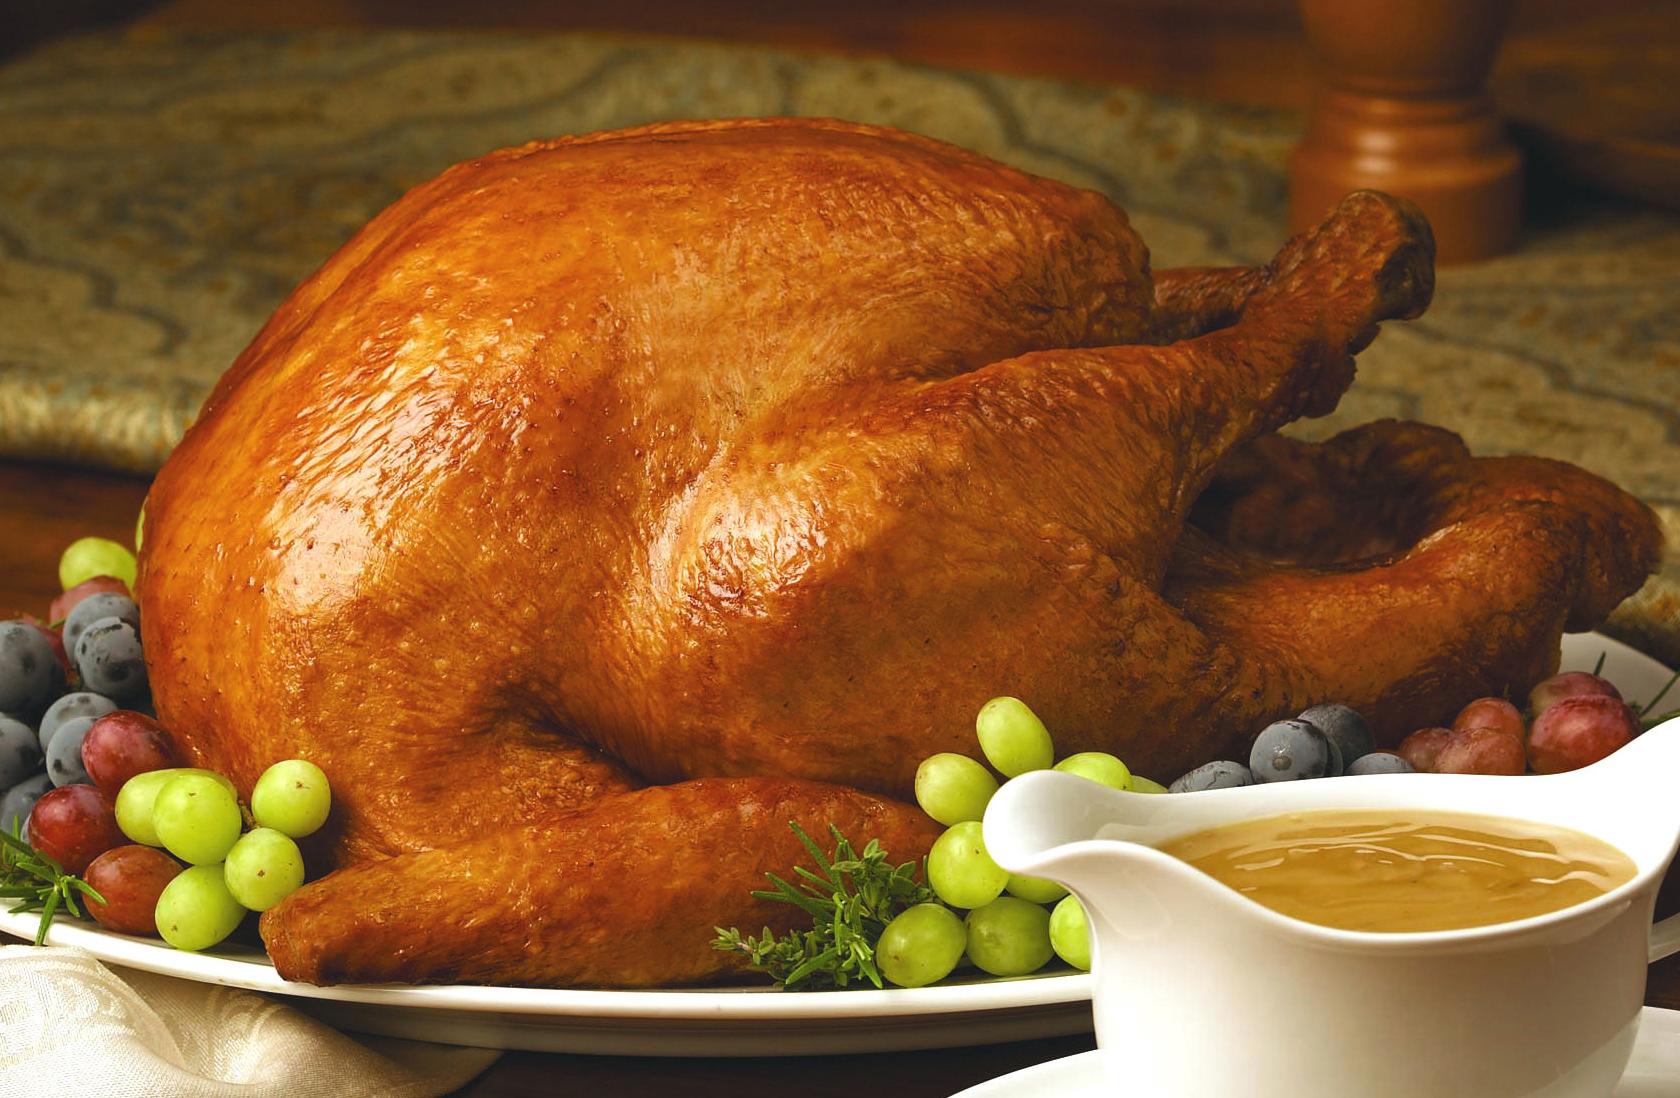 Freshco Canada Turkey Price Match: Get A Grade A Turkey For Other